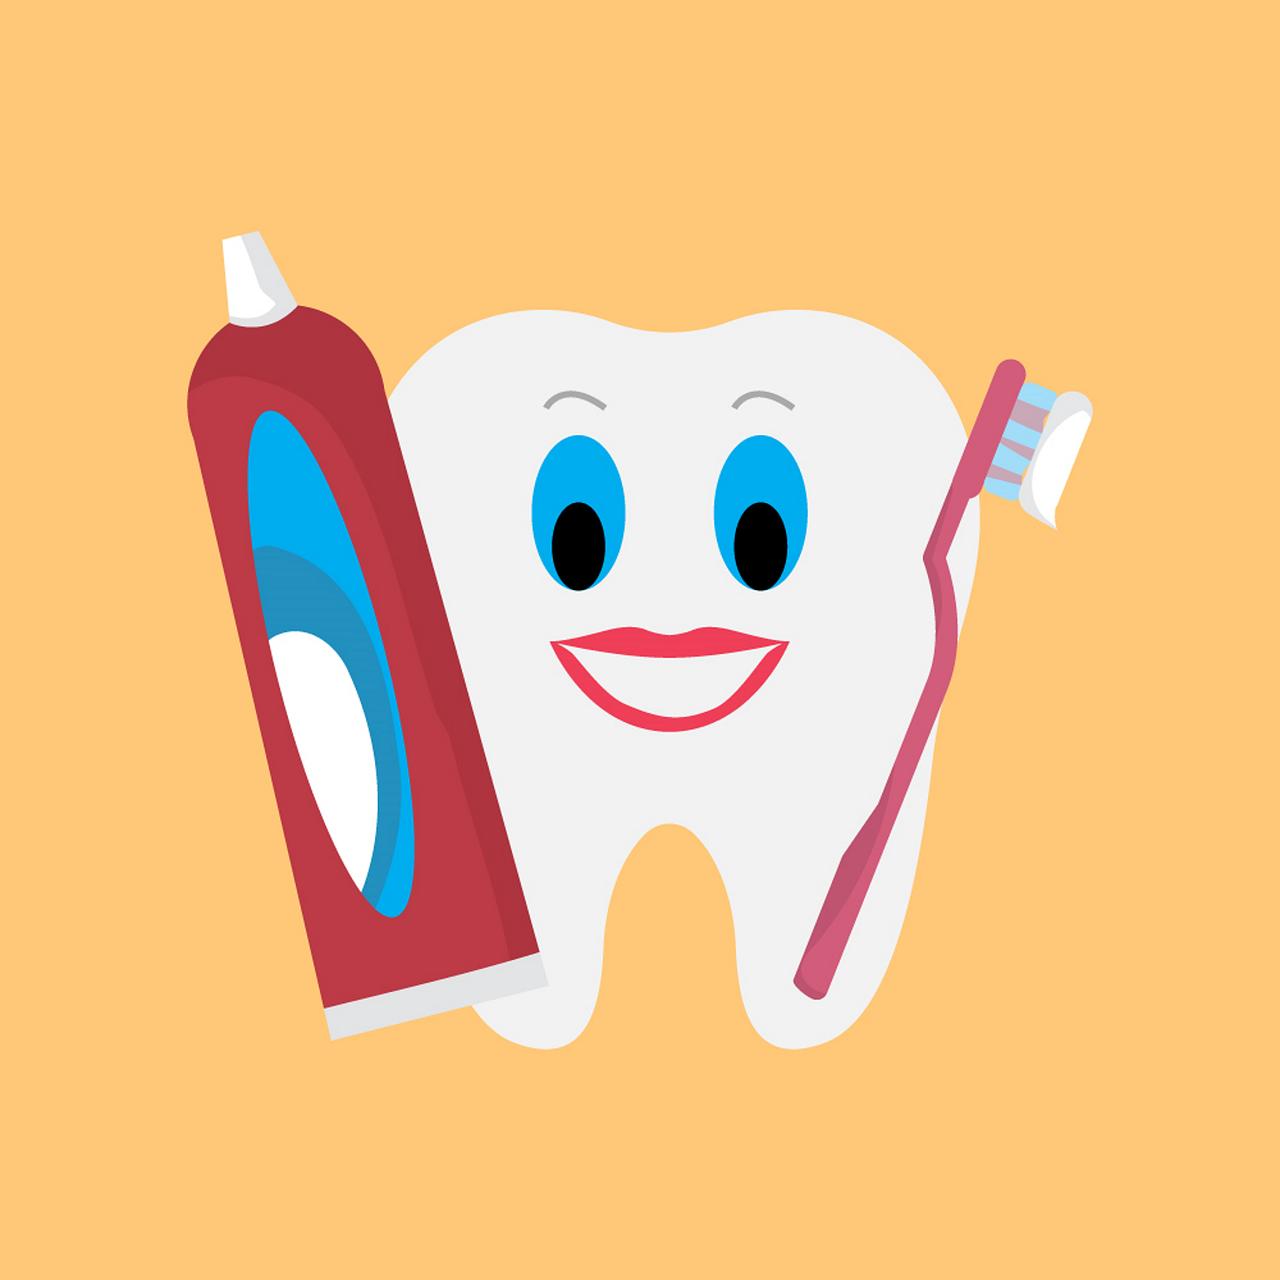 toothpaste-2356399_1280